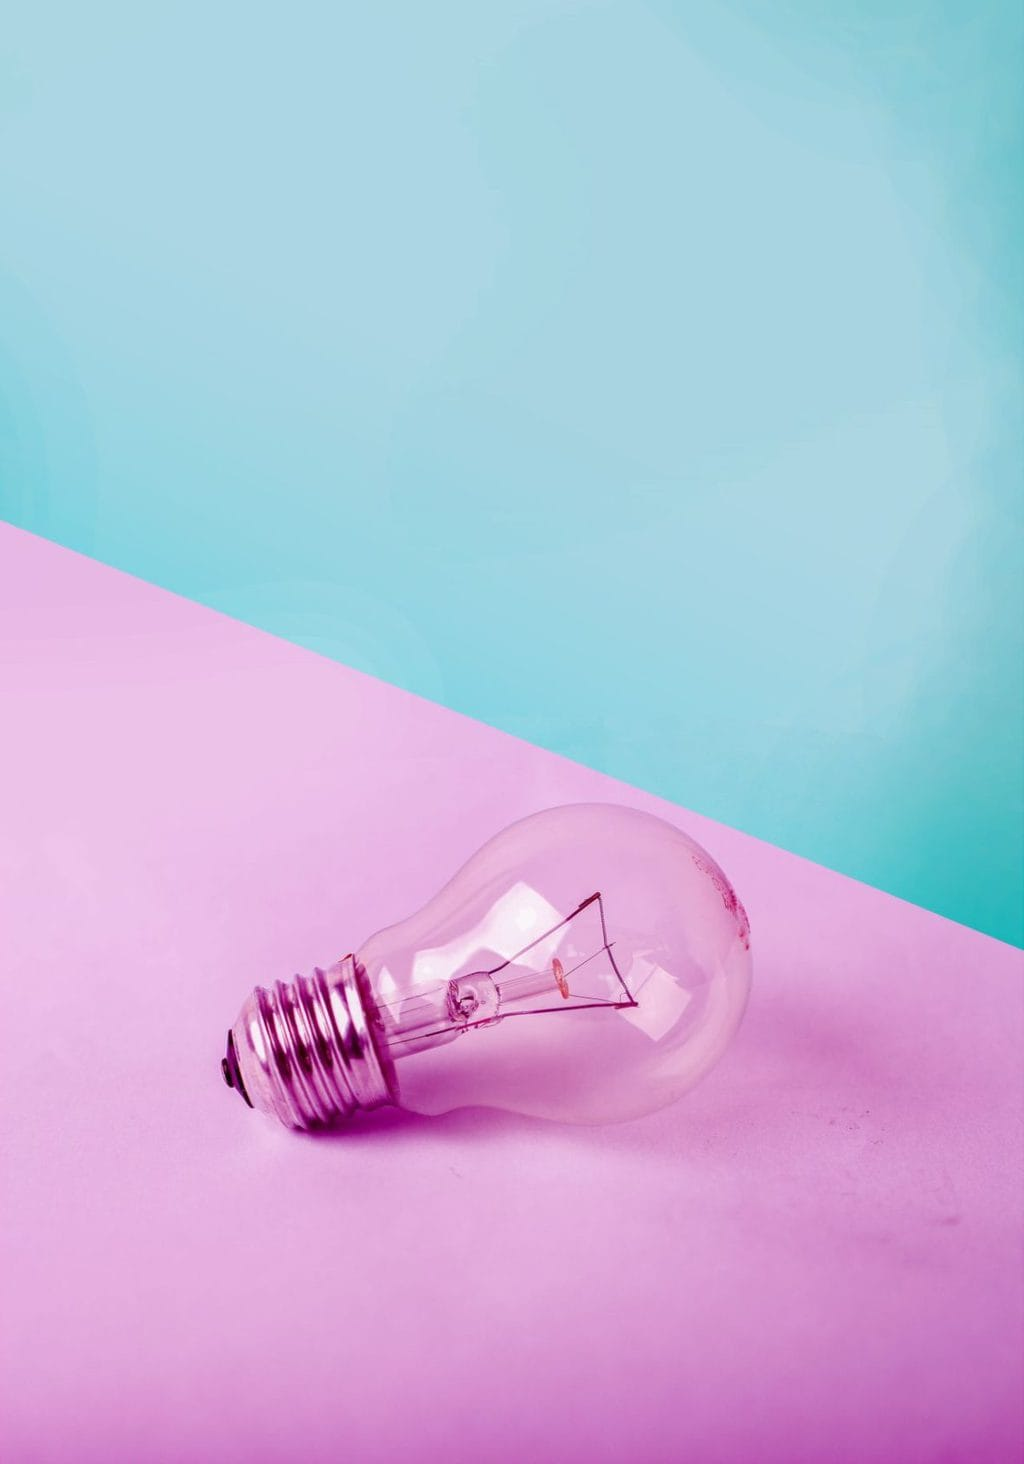 lightbulb on a pink background